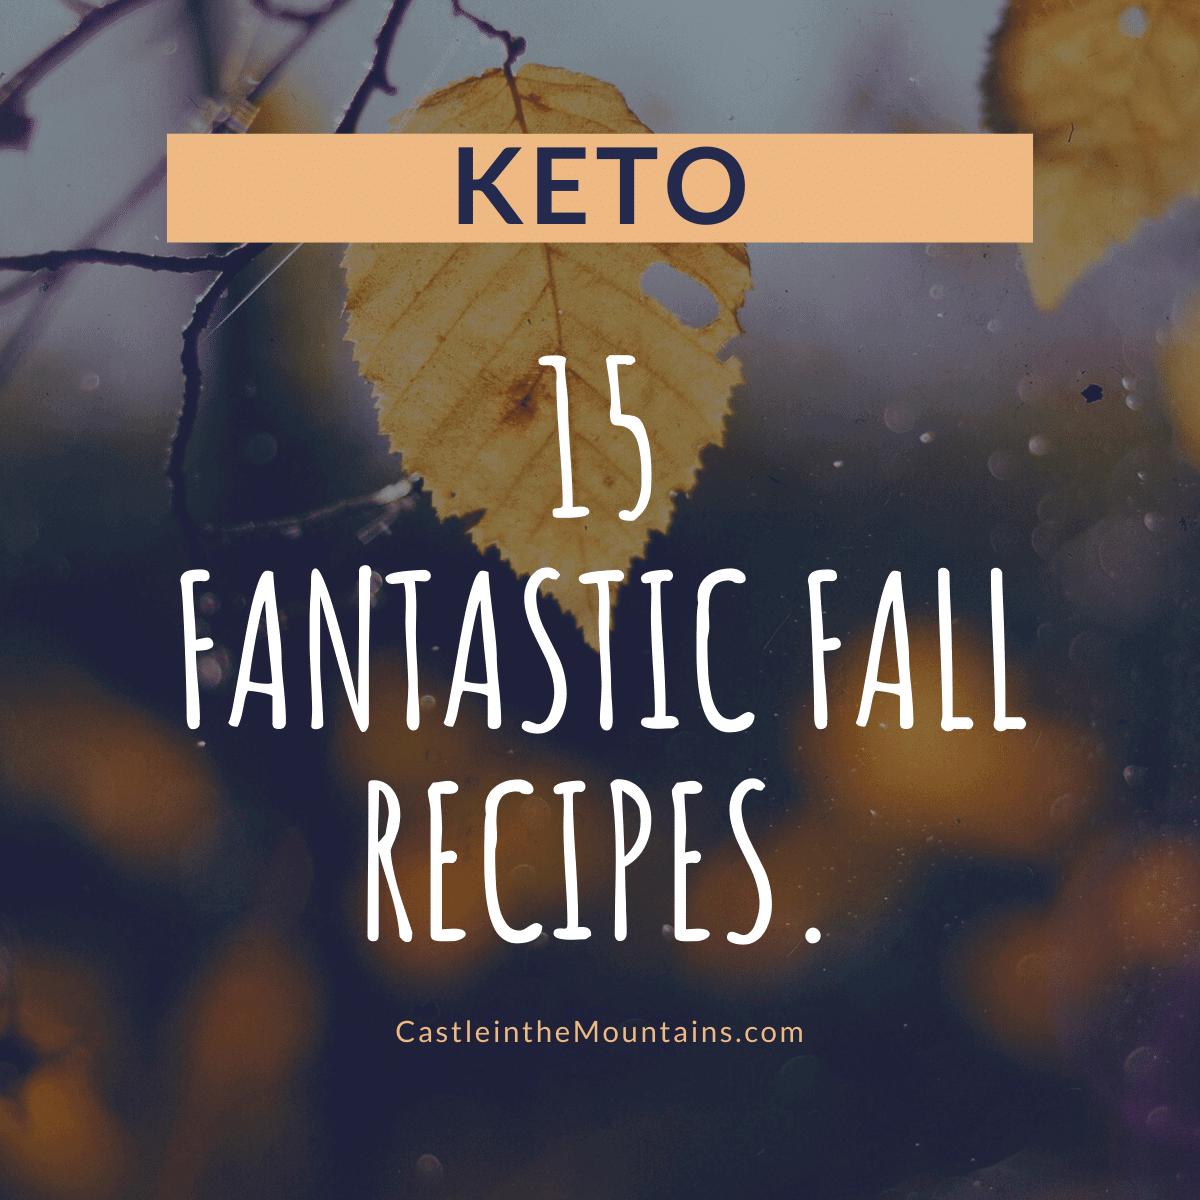 15 Fantastic Fall Recipes Keto Low Carb Gluten Free